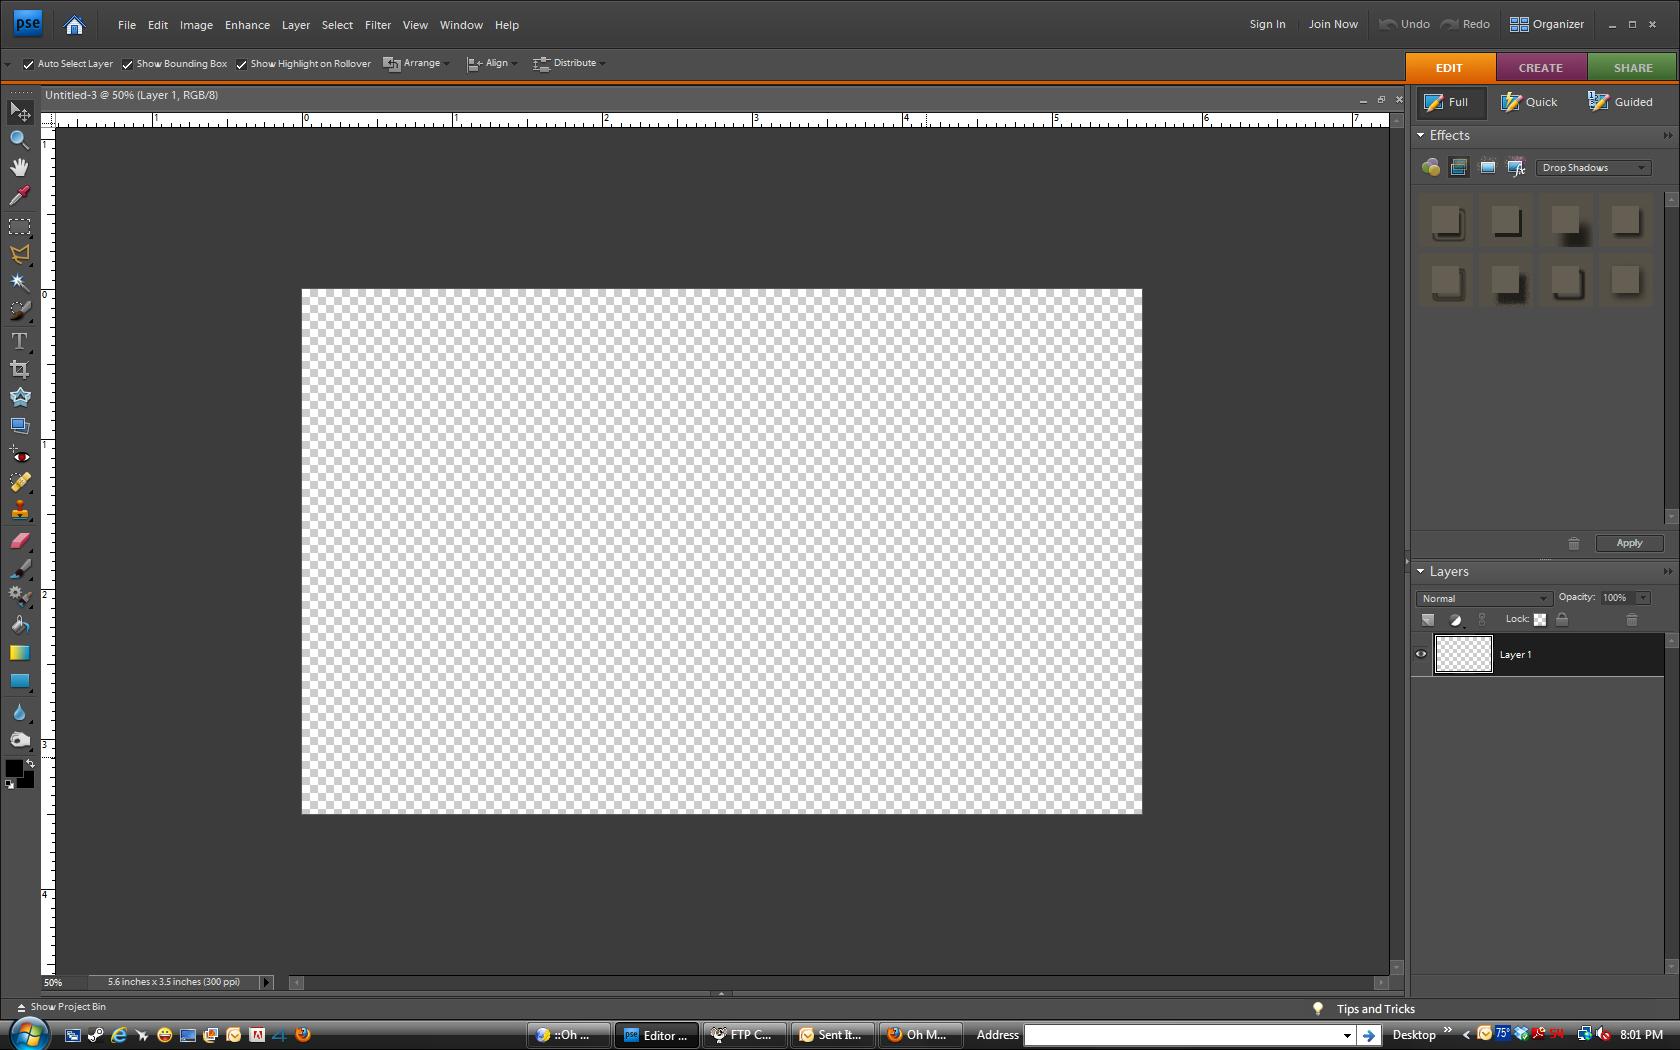 Create your own desktop background B2N2 Scraps 1680x1050